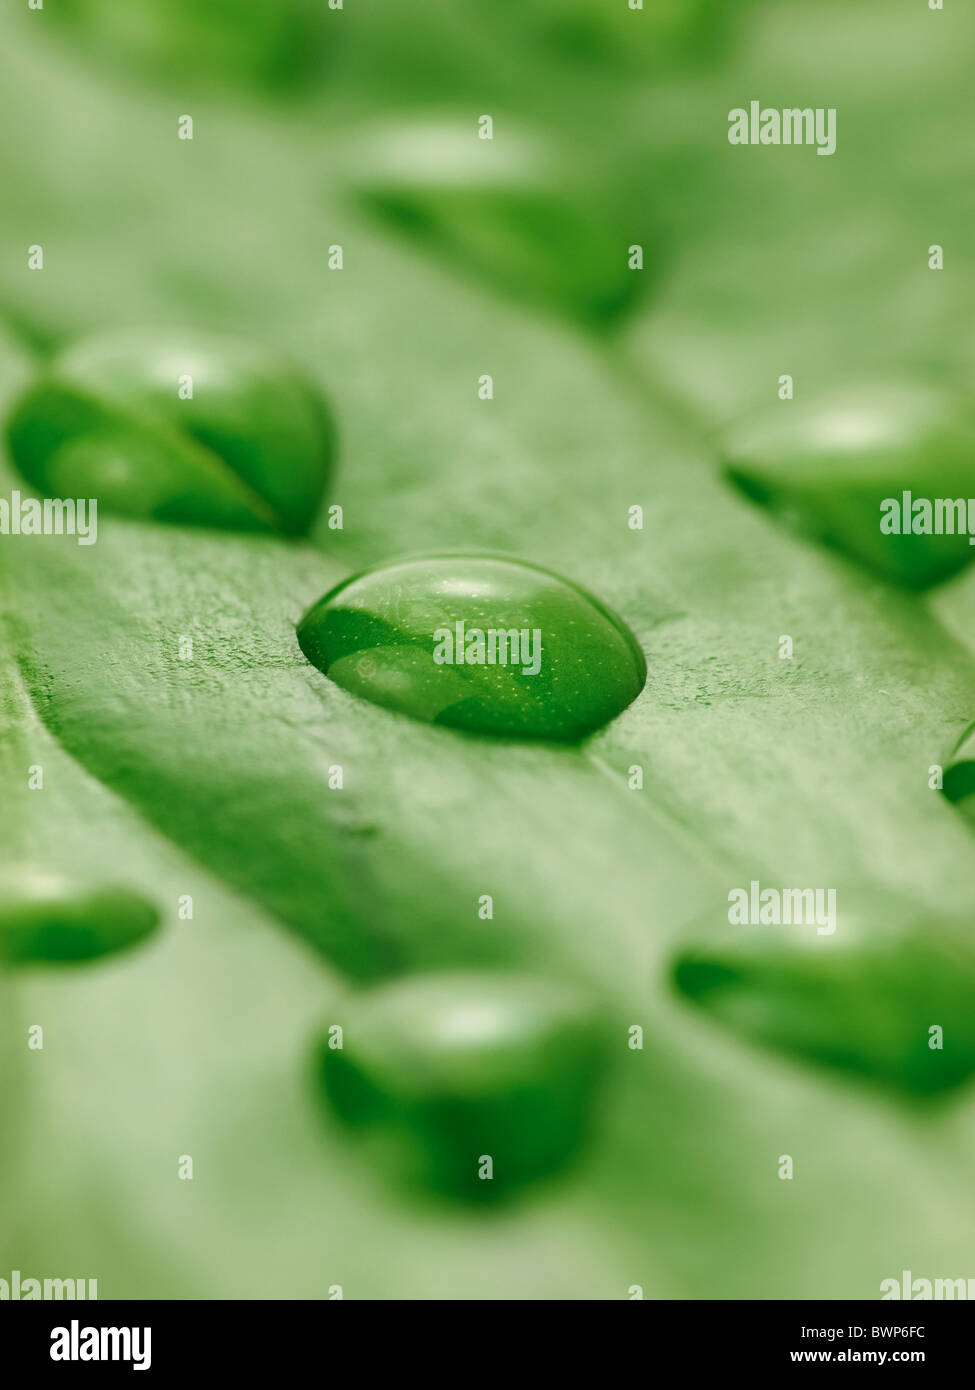 Gotas de agua sobre una hoja de cerca Imagen De Stock